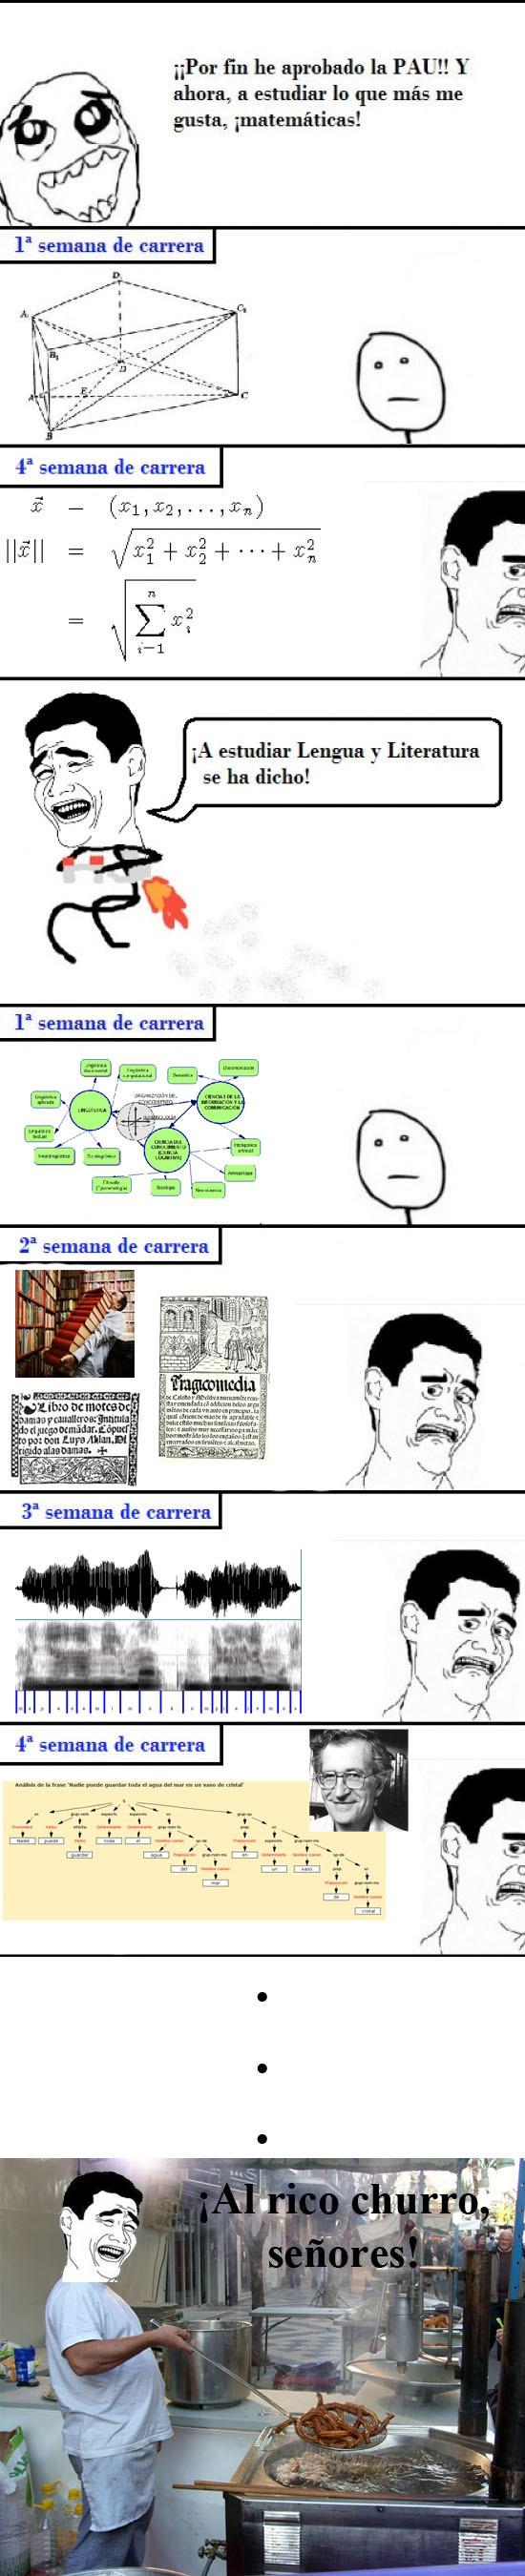 churros,filologia,nothing to do here,universidad,Yago ming